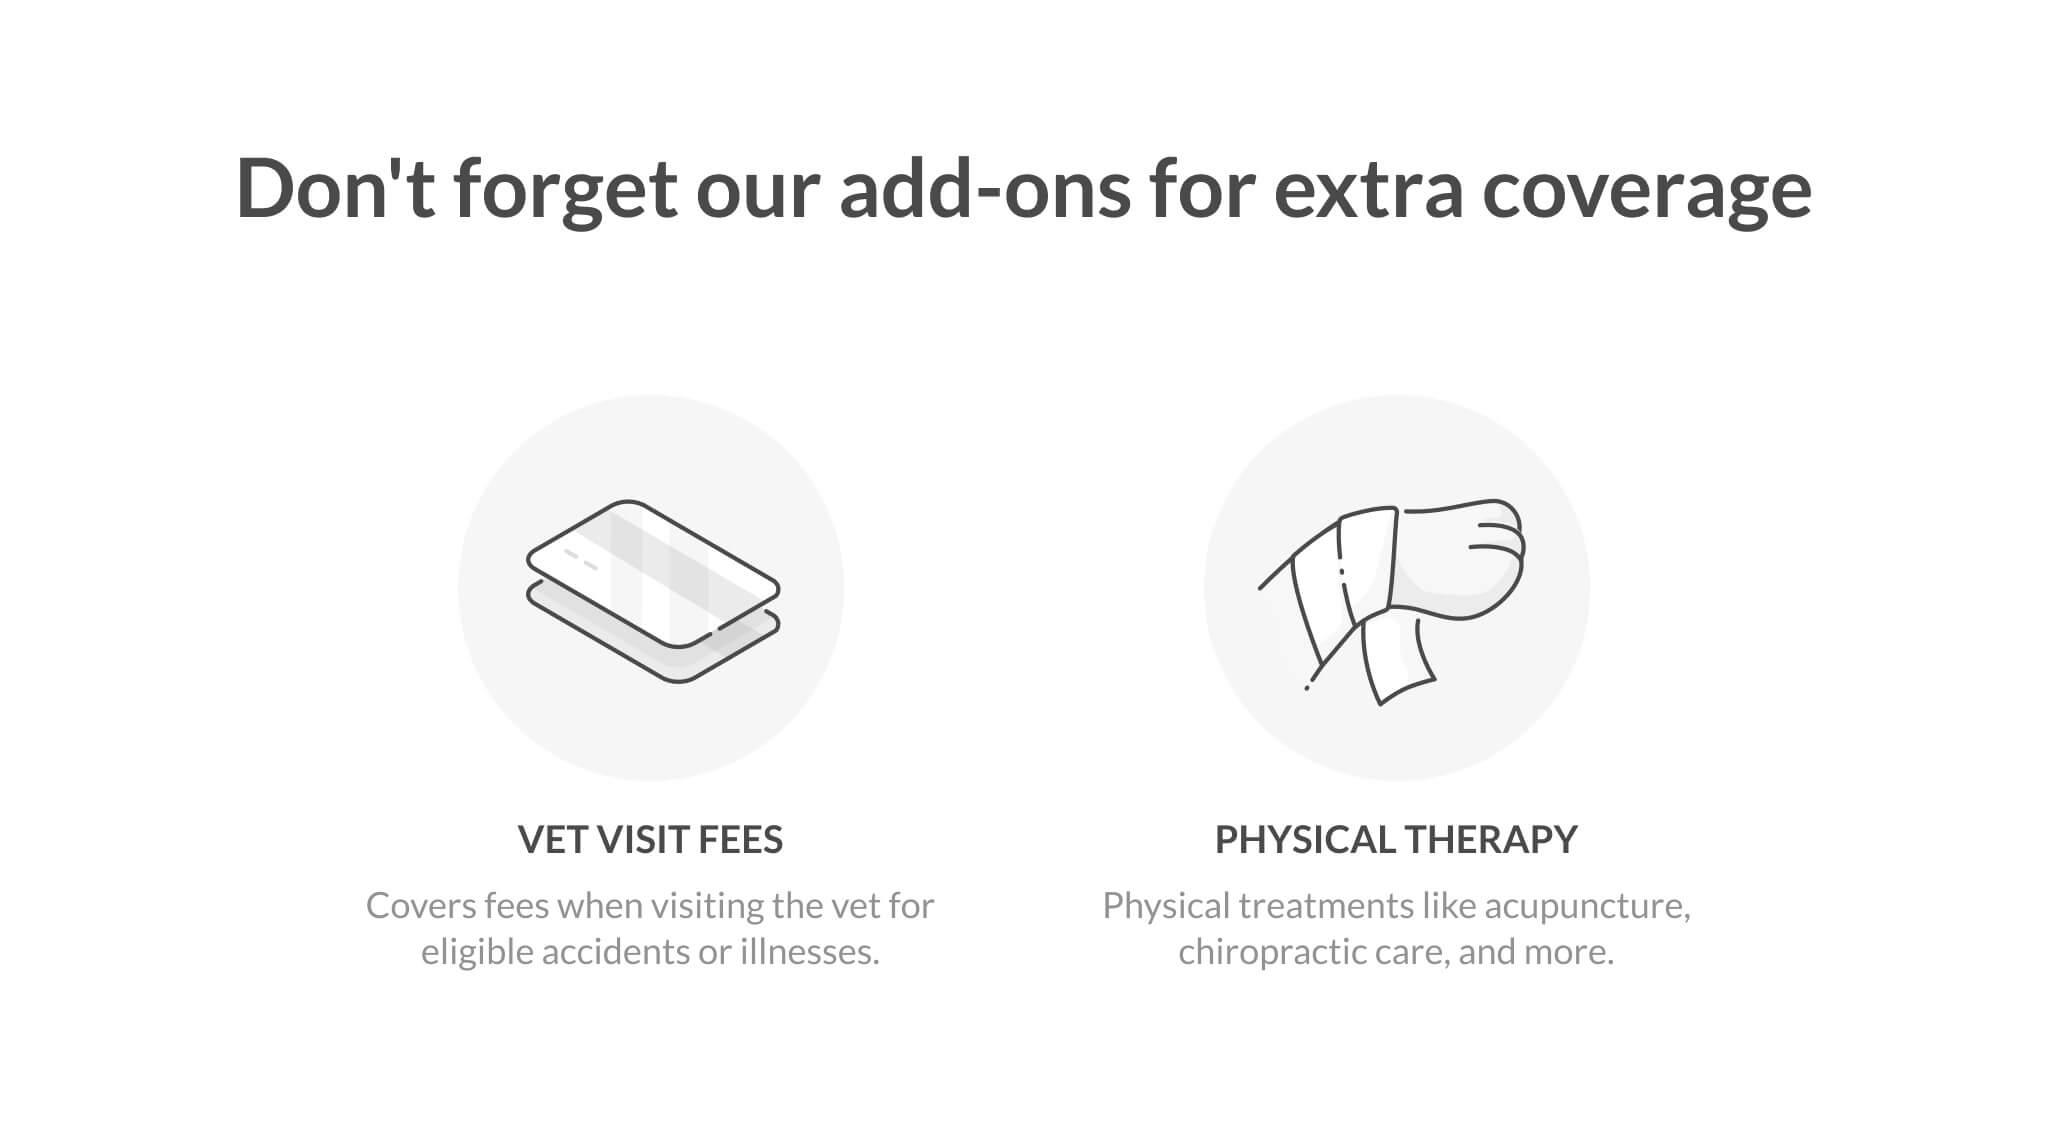 pet insurance add-ons